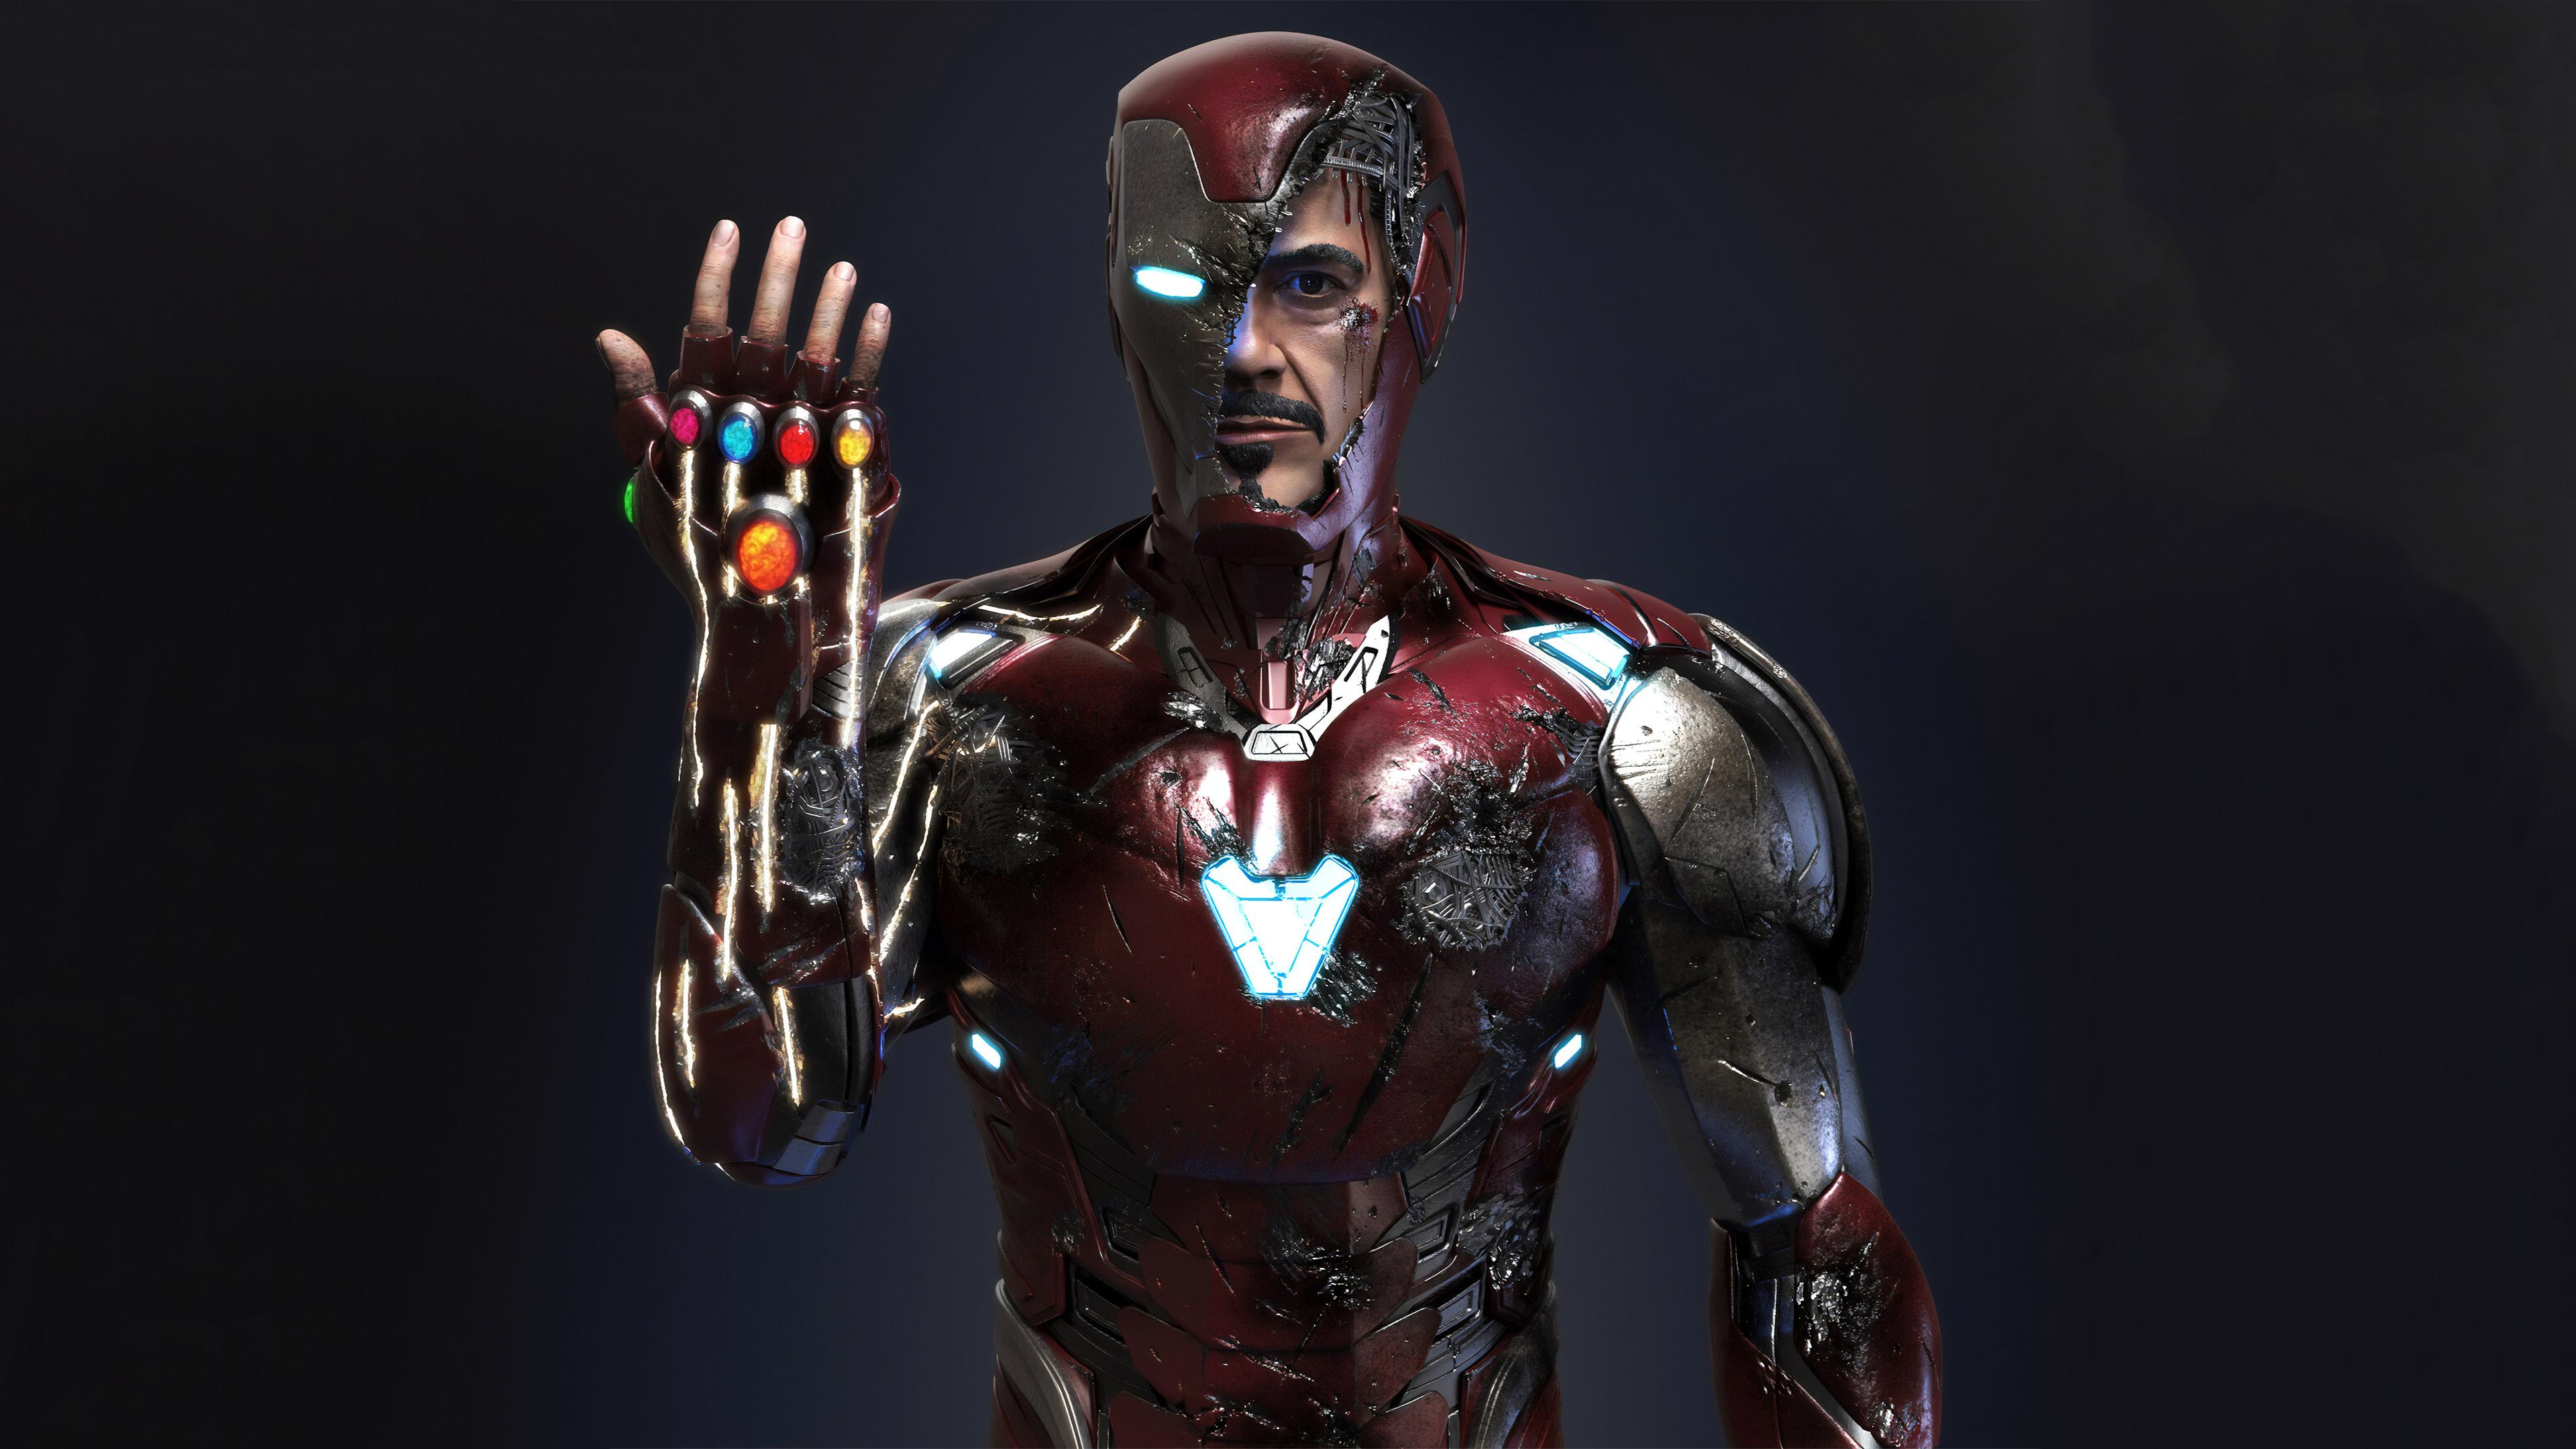 3840x2160 Iron Man Infinity Gauntlet 4k Art 4k Hd 4k